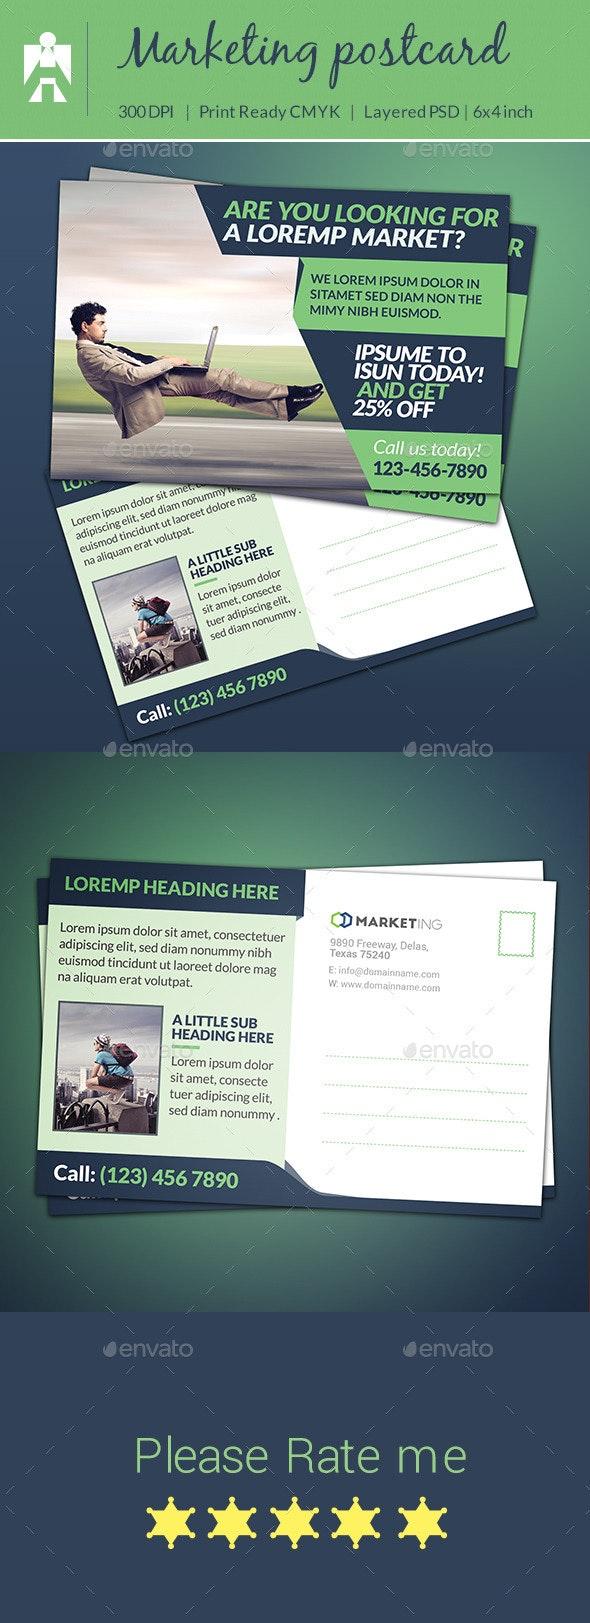 Corporate Marketing Postcard - Cards & Invites Print Templates